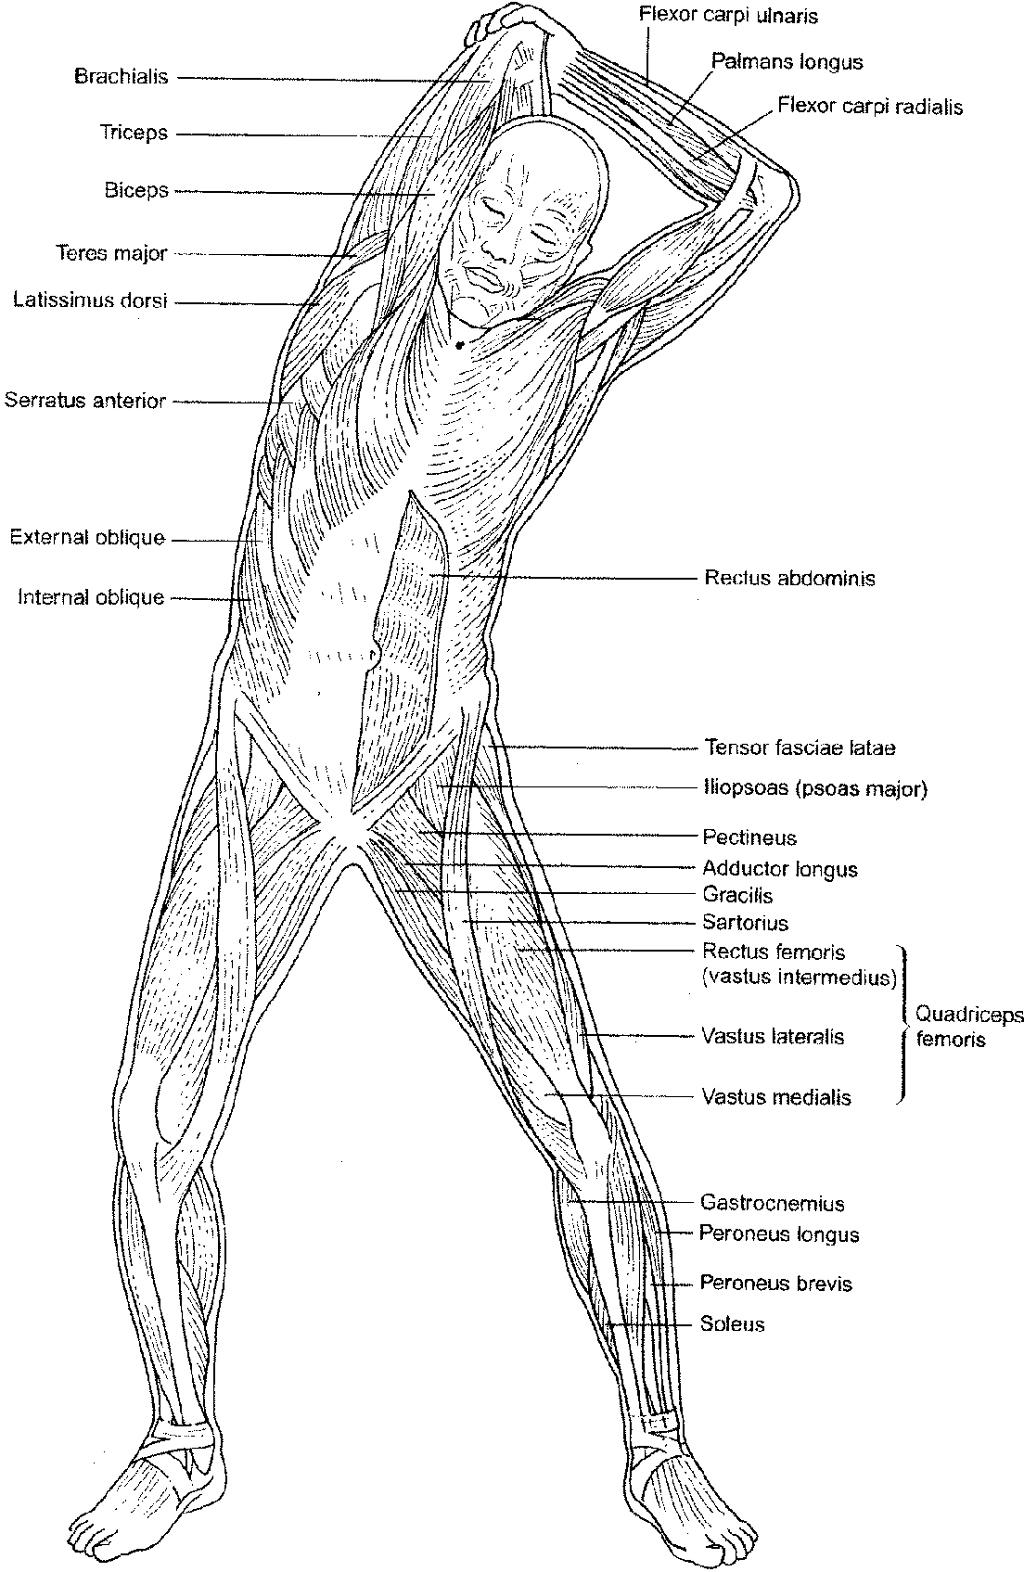 Anatomy coloring #16, Download drawings